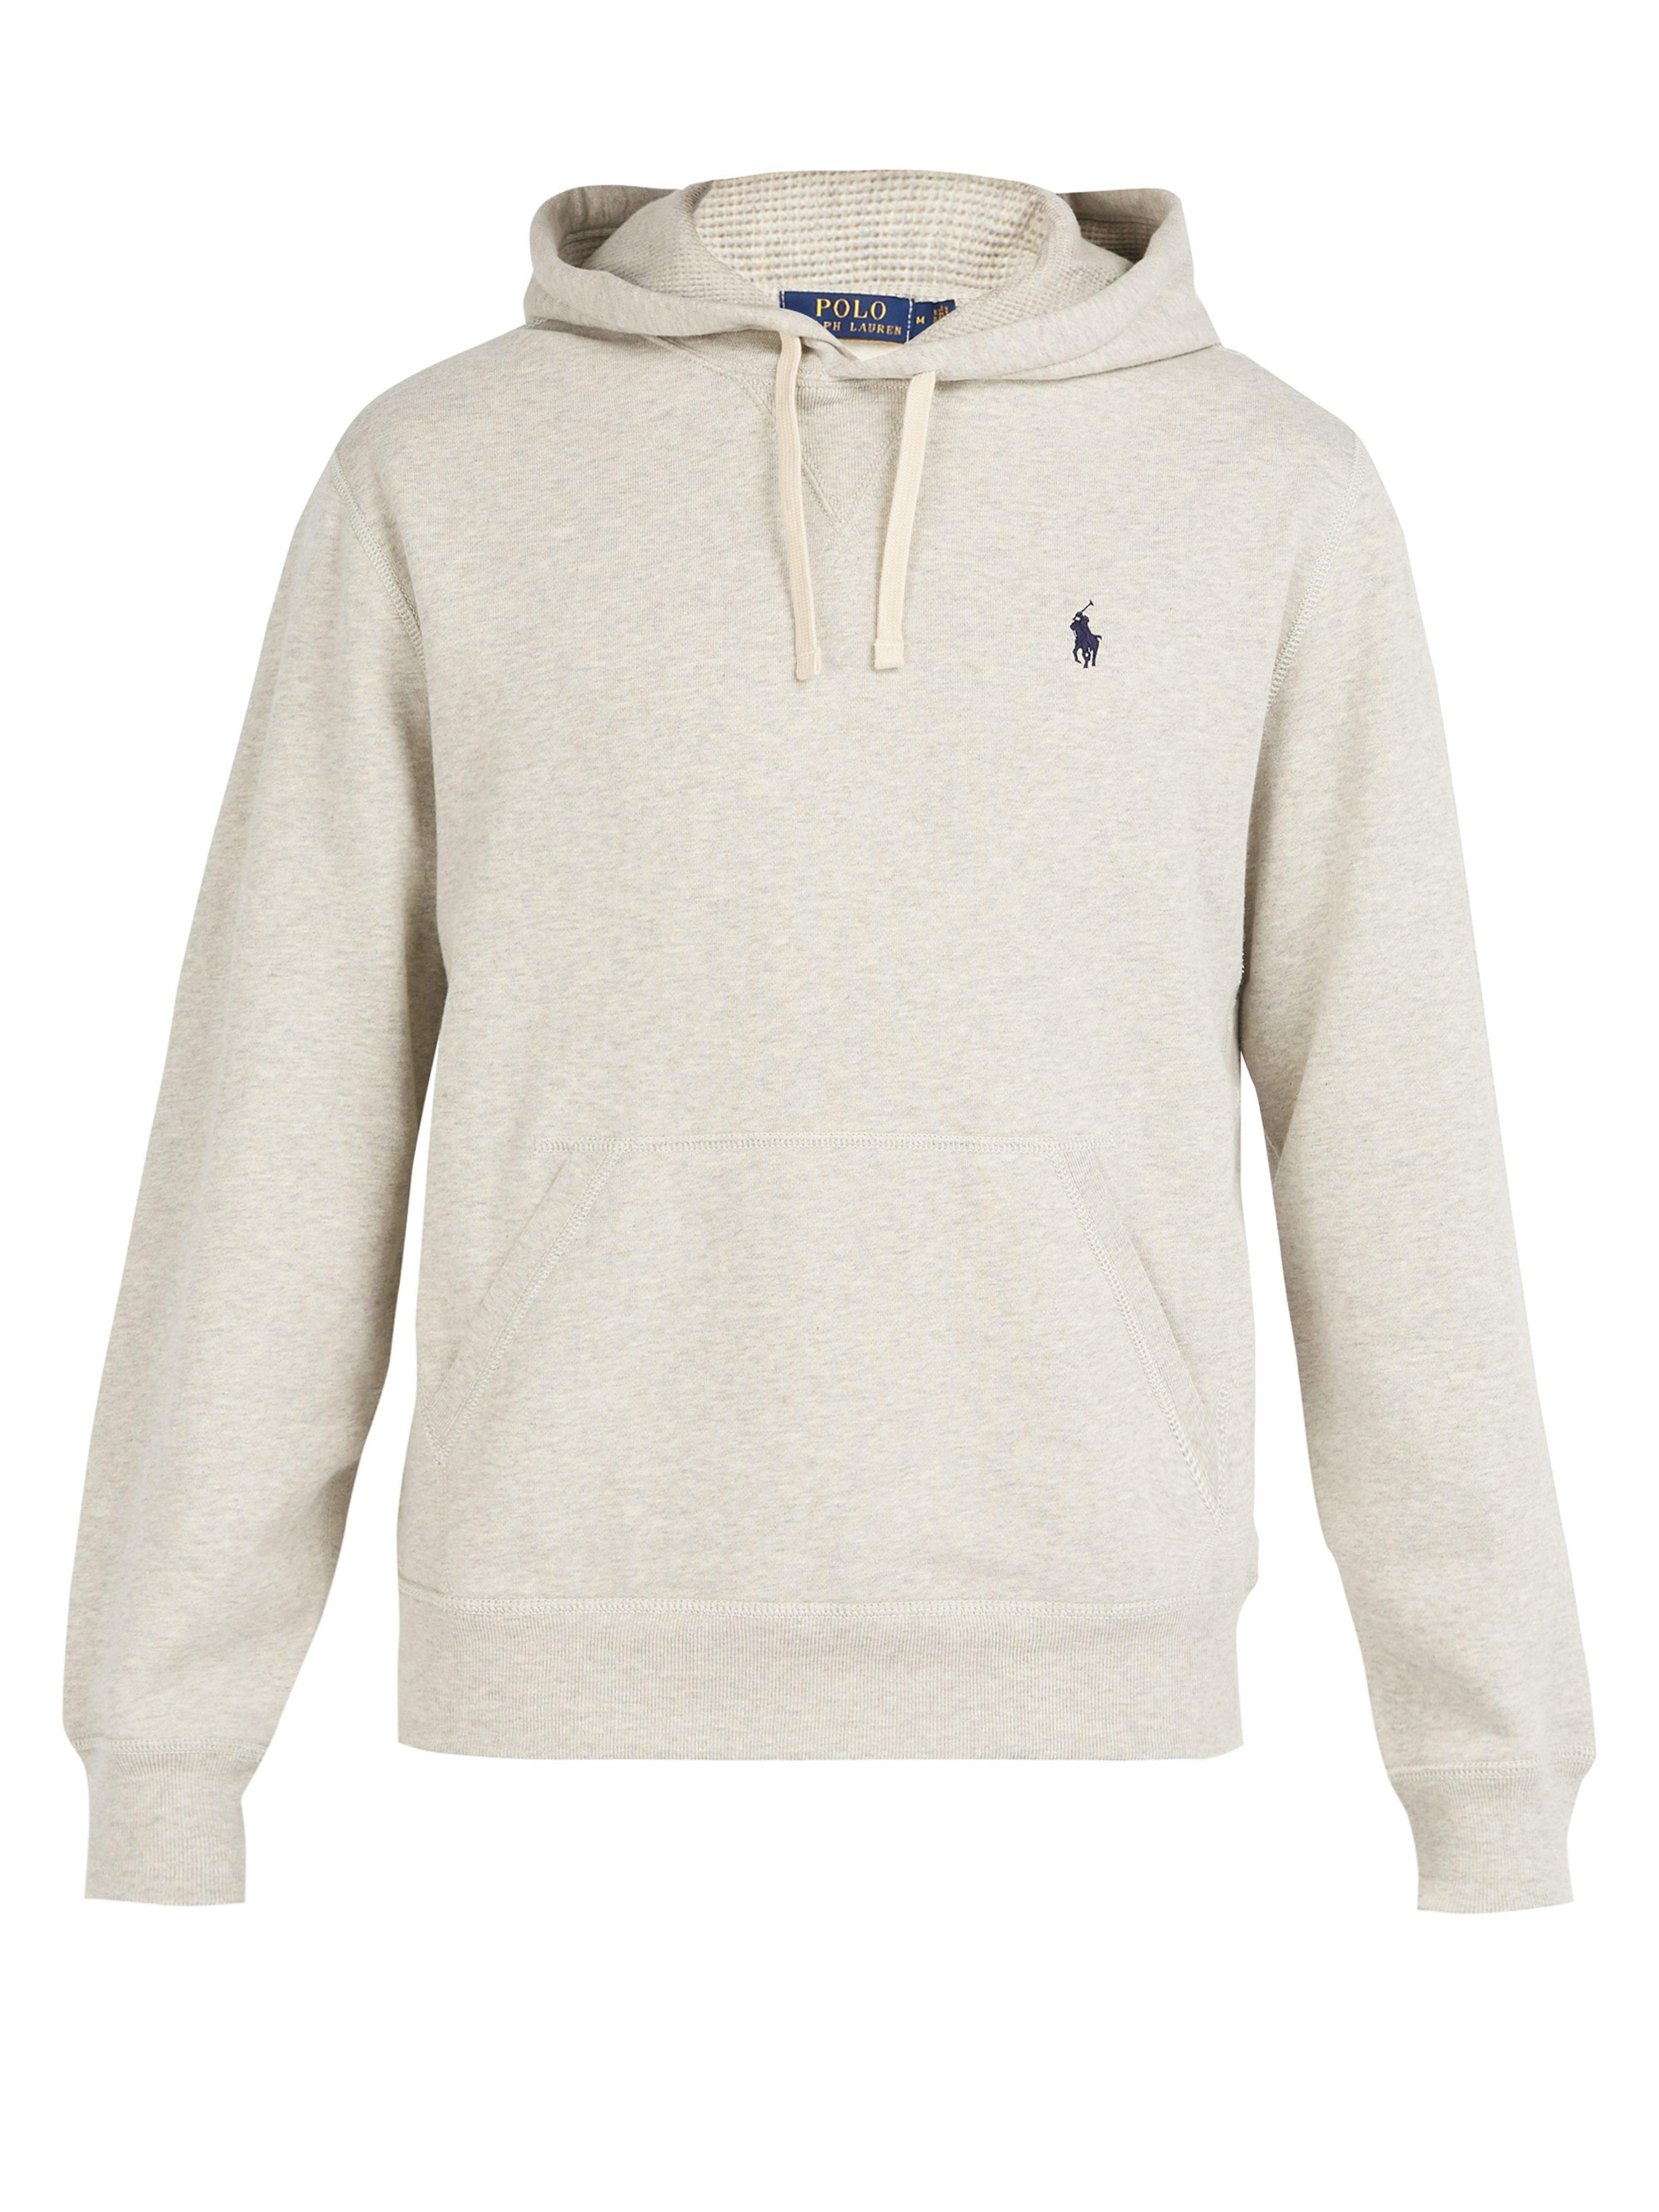 abb25acd8440 Polo Ralph Lauren. Men s Gray Fleece Back Cotton Jersey Hooded Sweatshirt